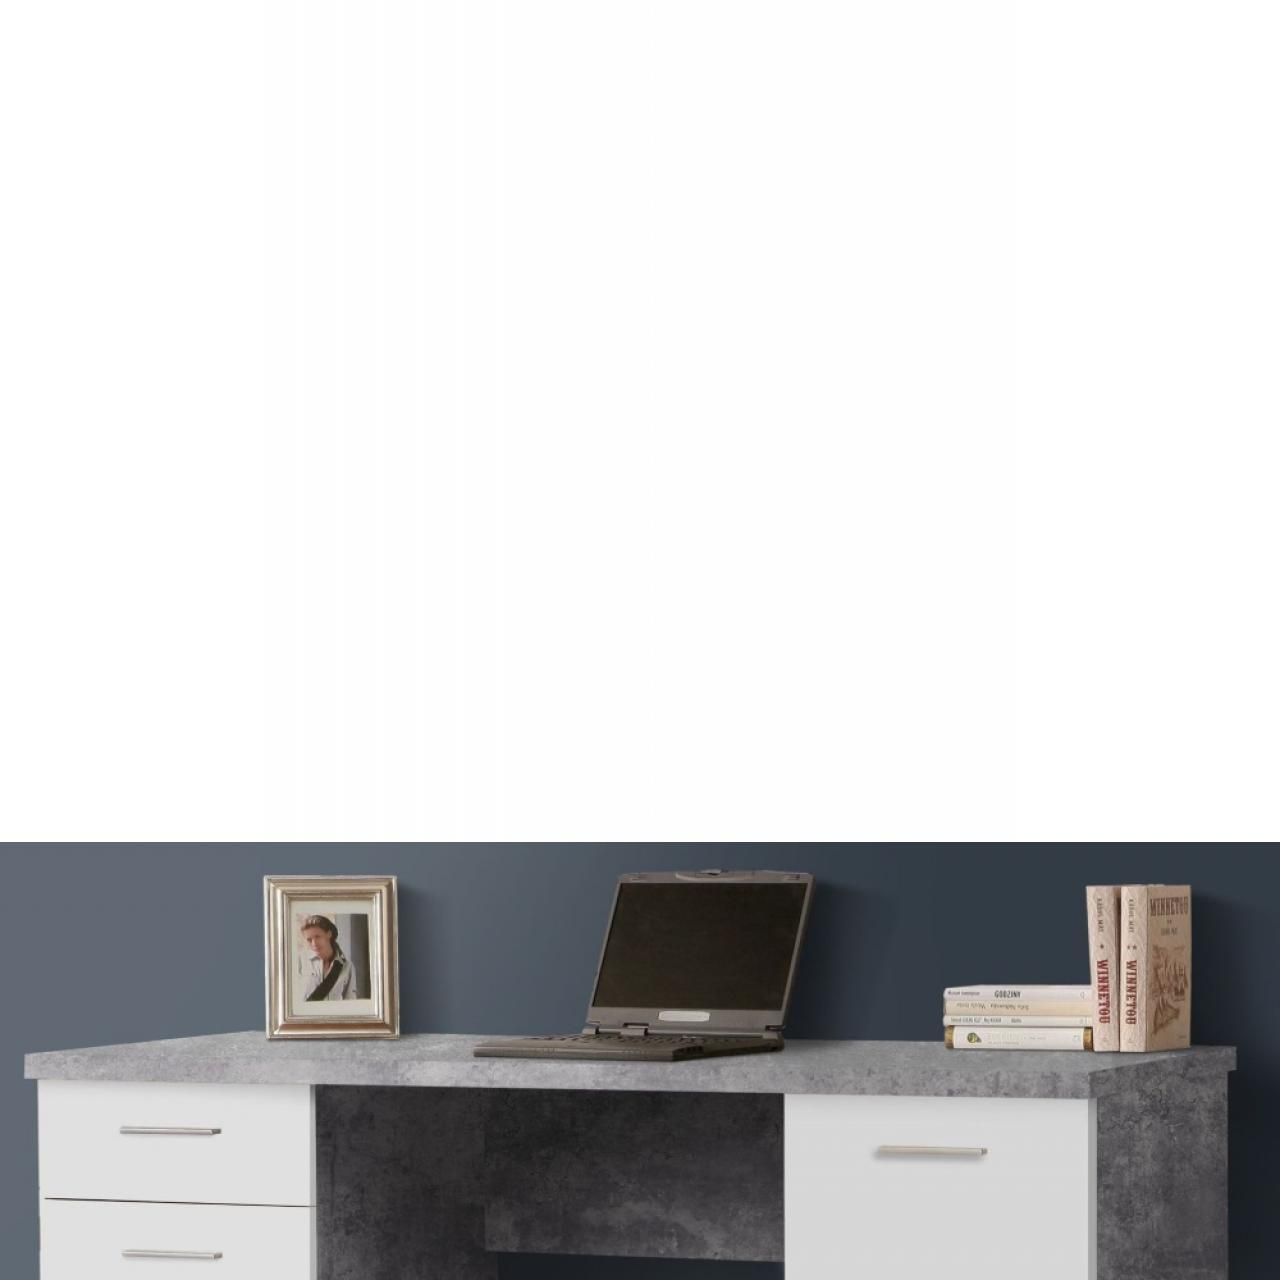 Schreibtisch Net Betonoptik 145x60 cm